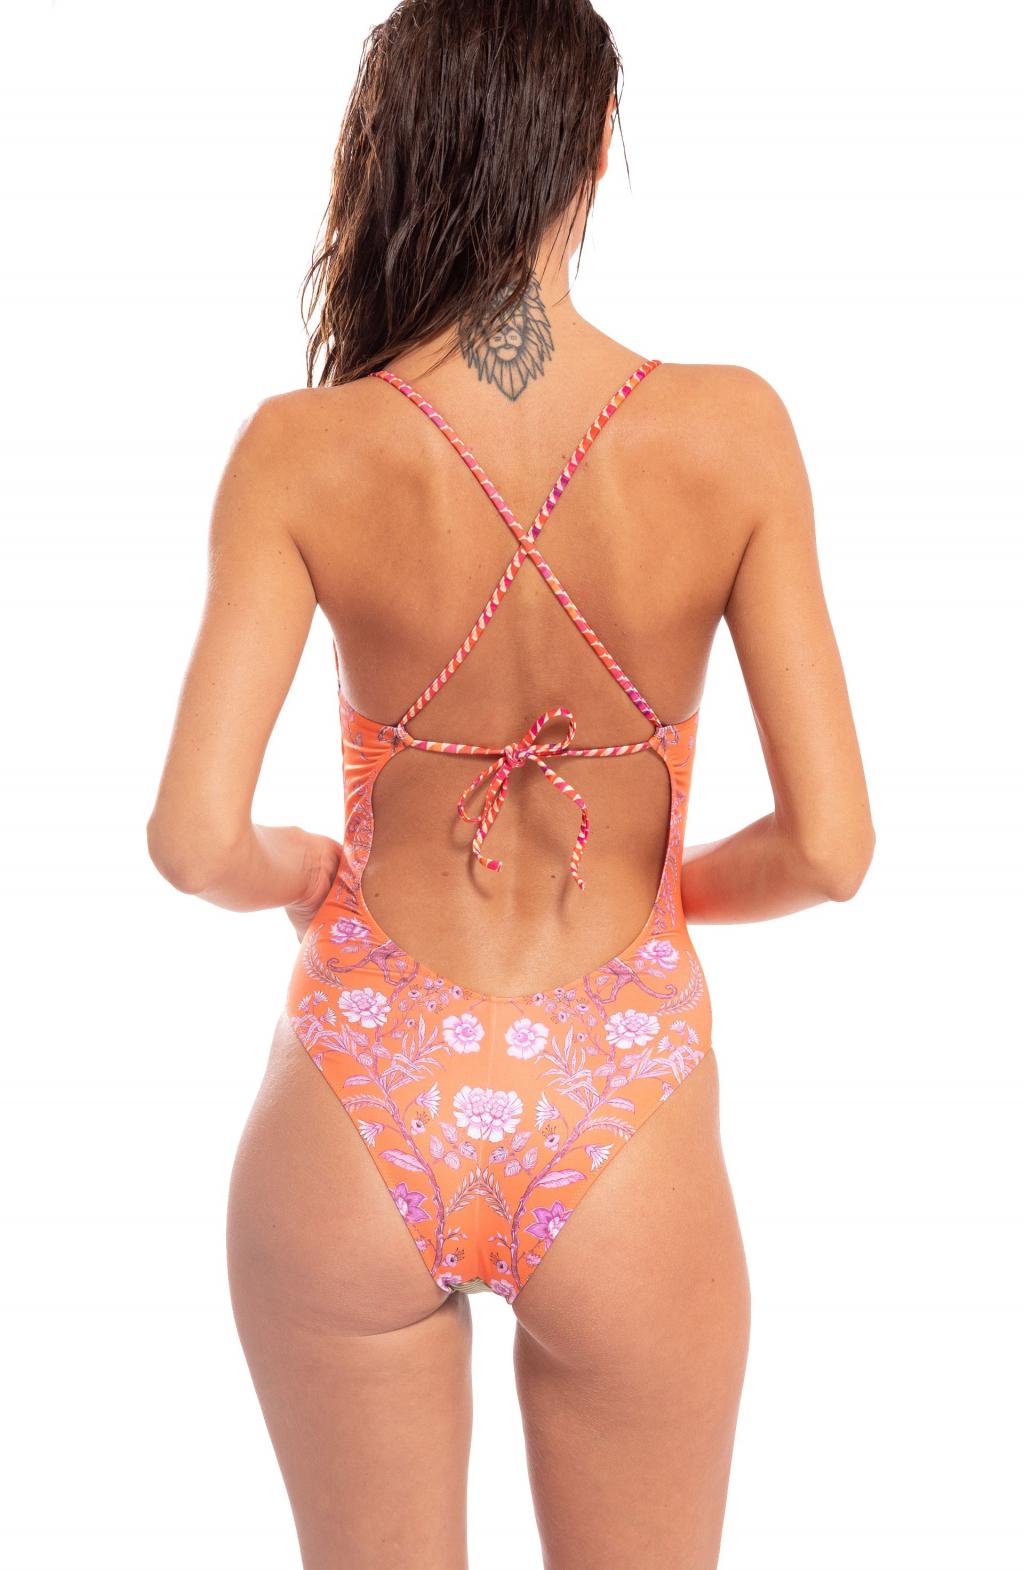 Sexy Slip Profili Borchie